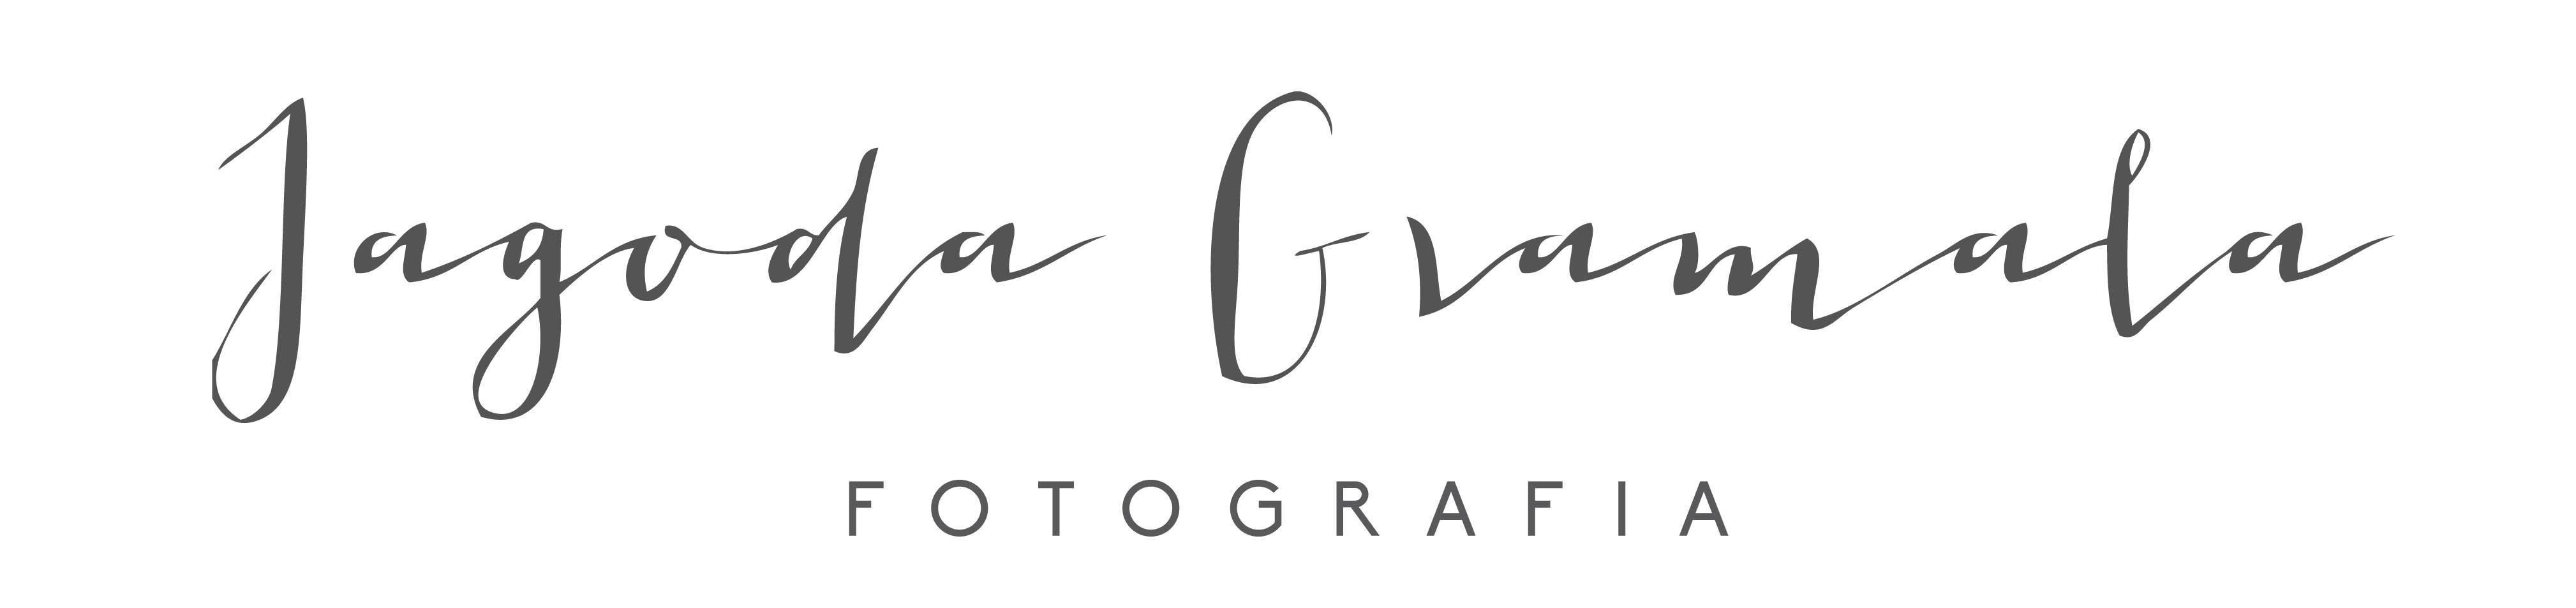 Jagoda Gramala Fotografia